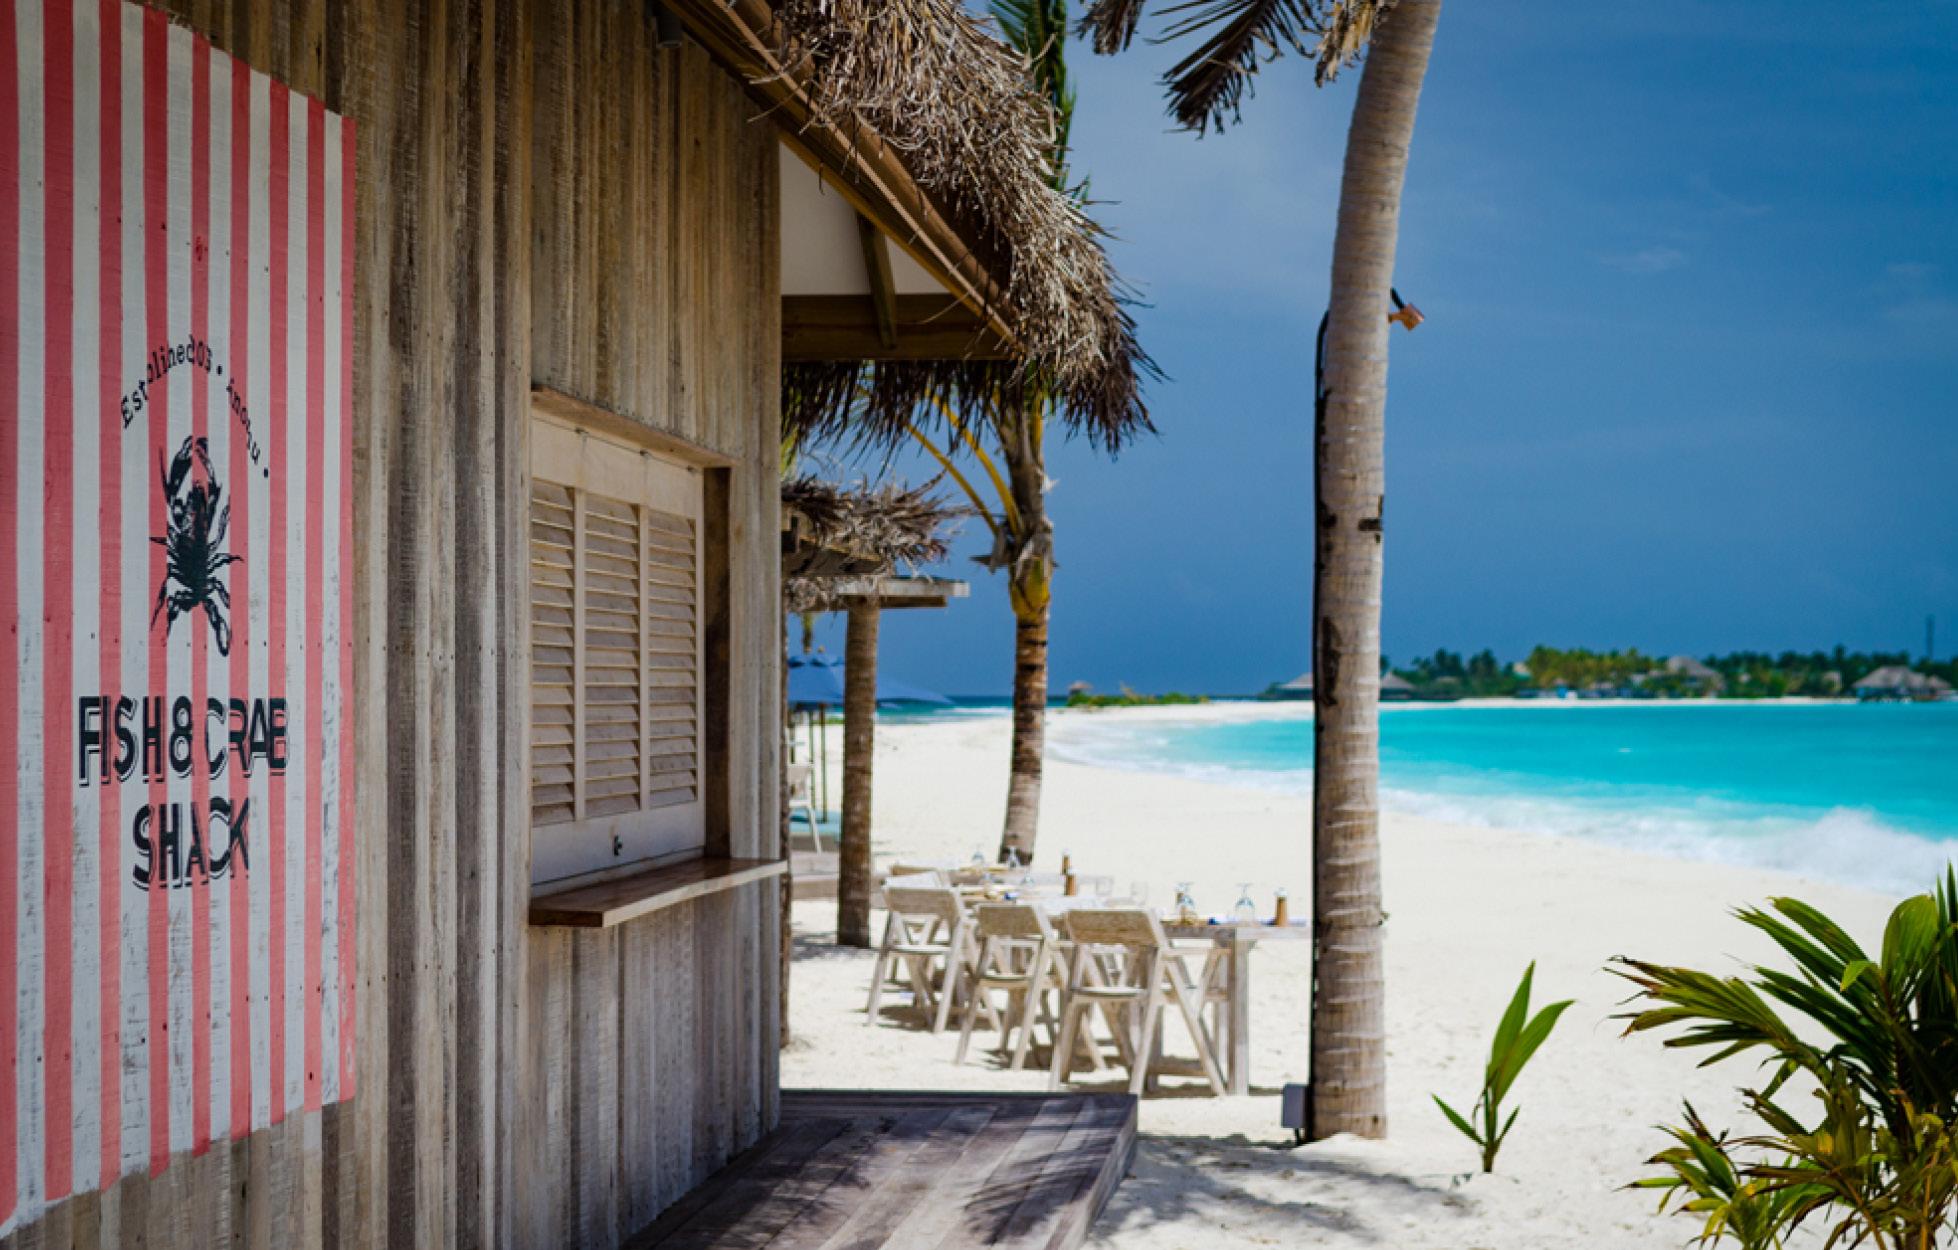 finolhu crabshack beach bar the maldives